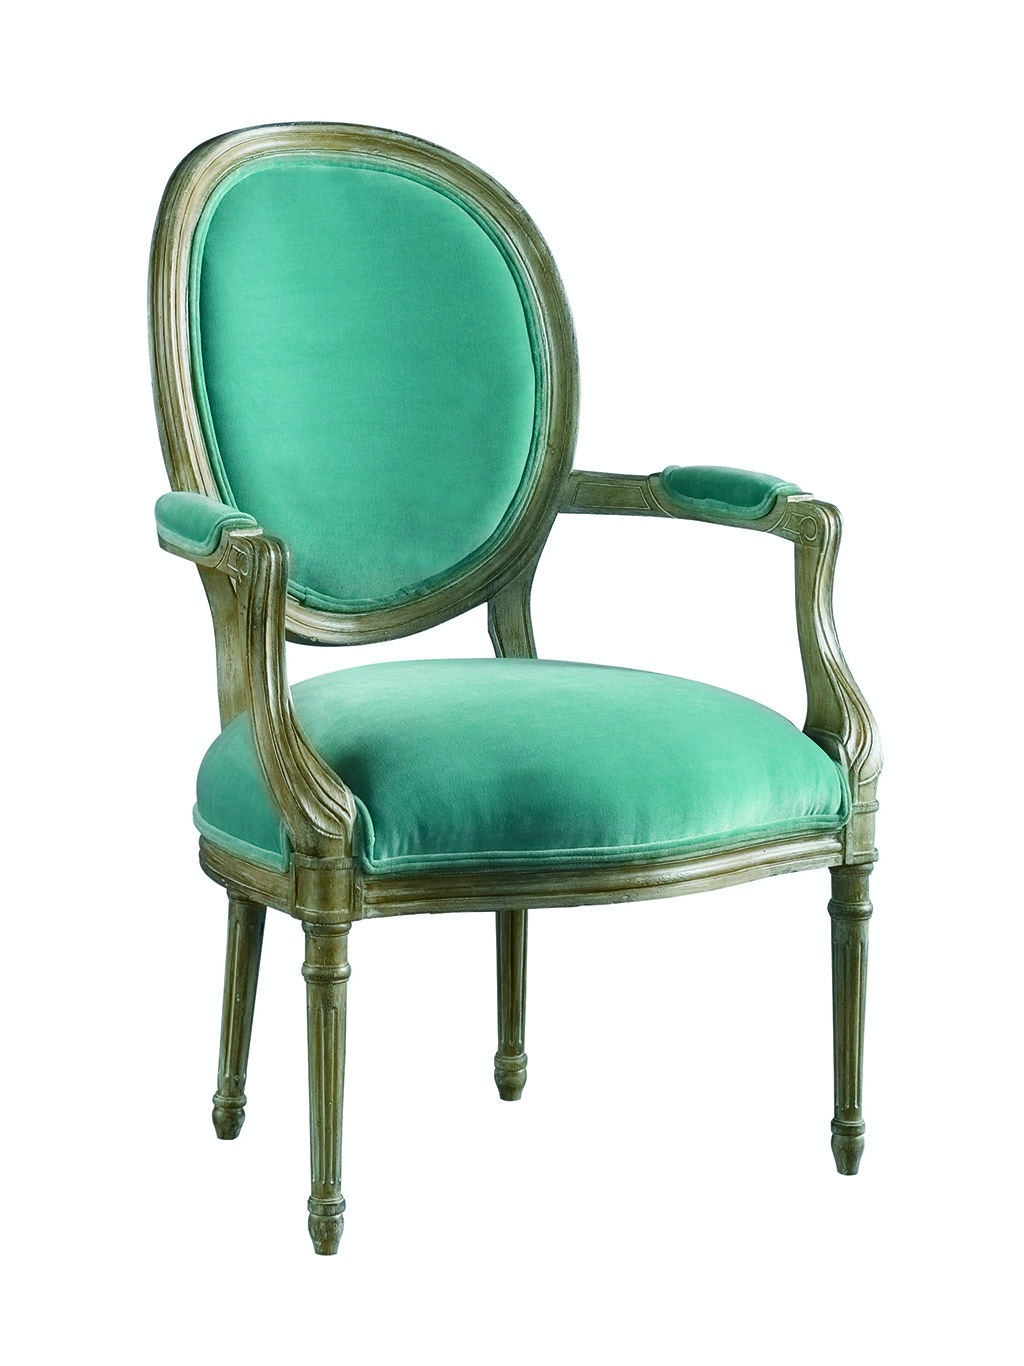 LA1102C. Beckmore Host Chair · LA1102C · Lillian August For Hickory White